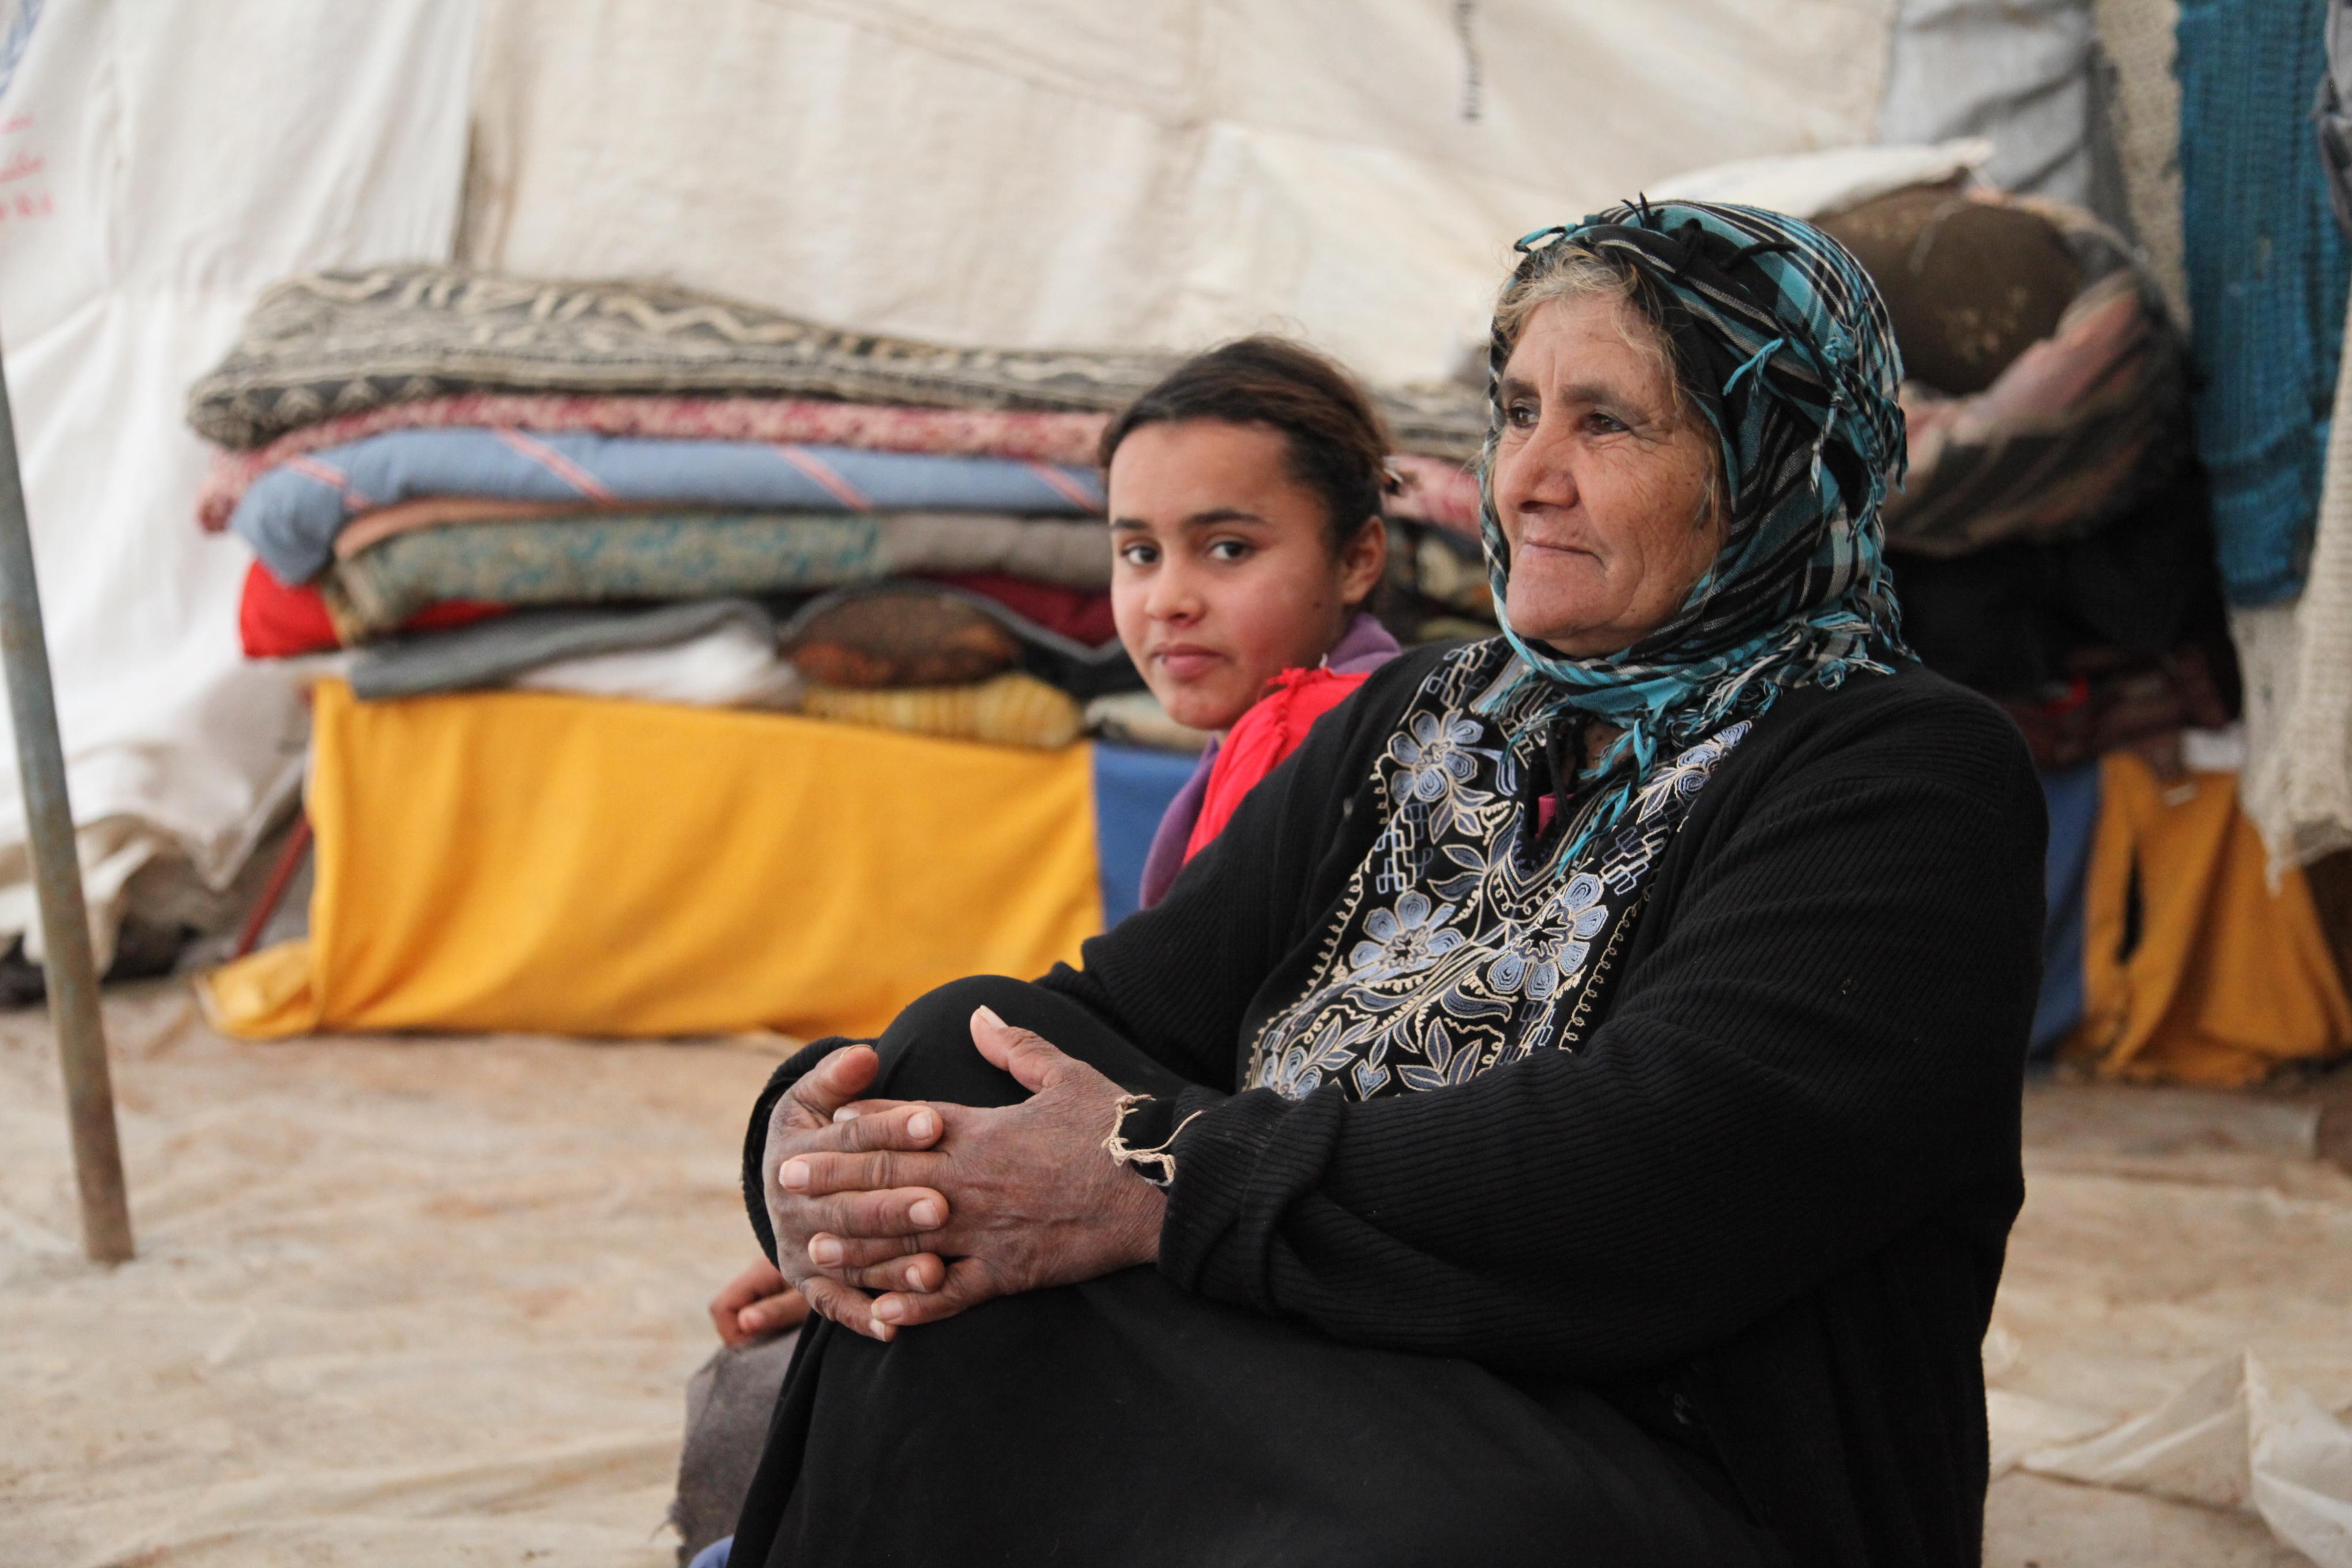 Fatima Abid Aouda Soraiya Fakir, displaced from the village of Al-Maitah. Zahra Moloo/IRIN